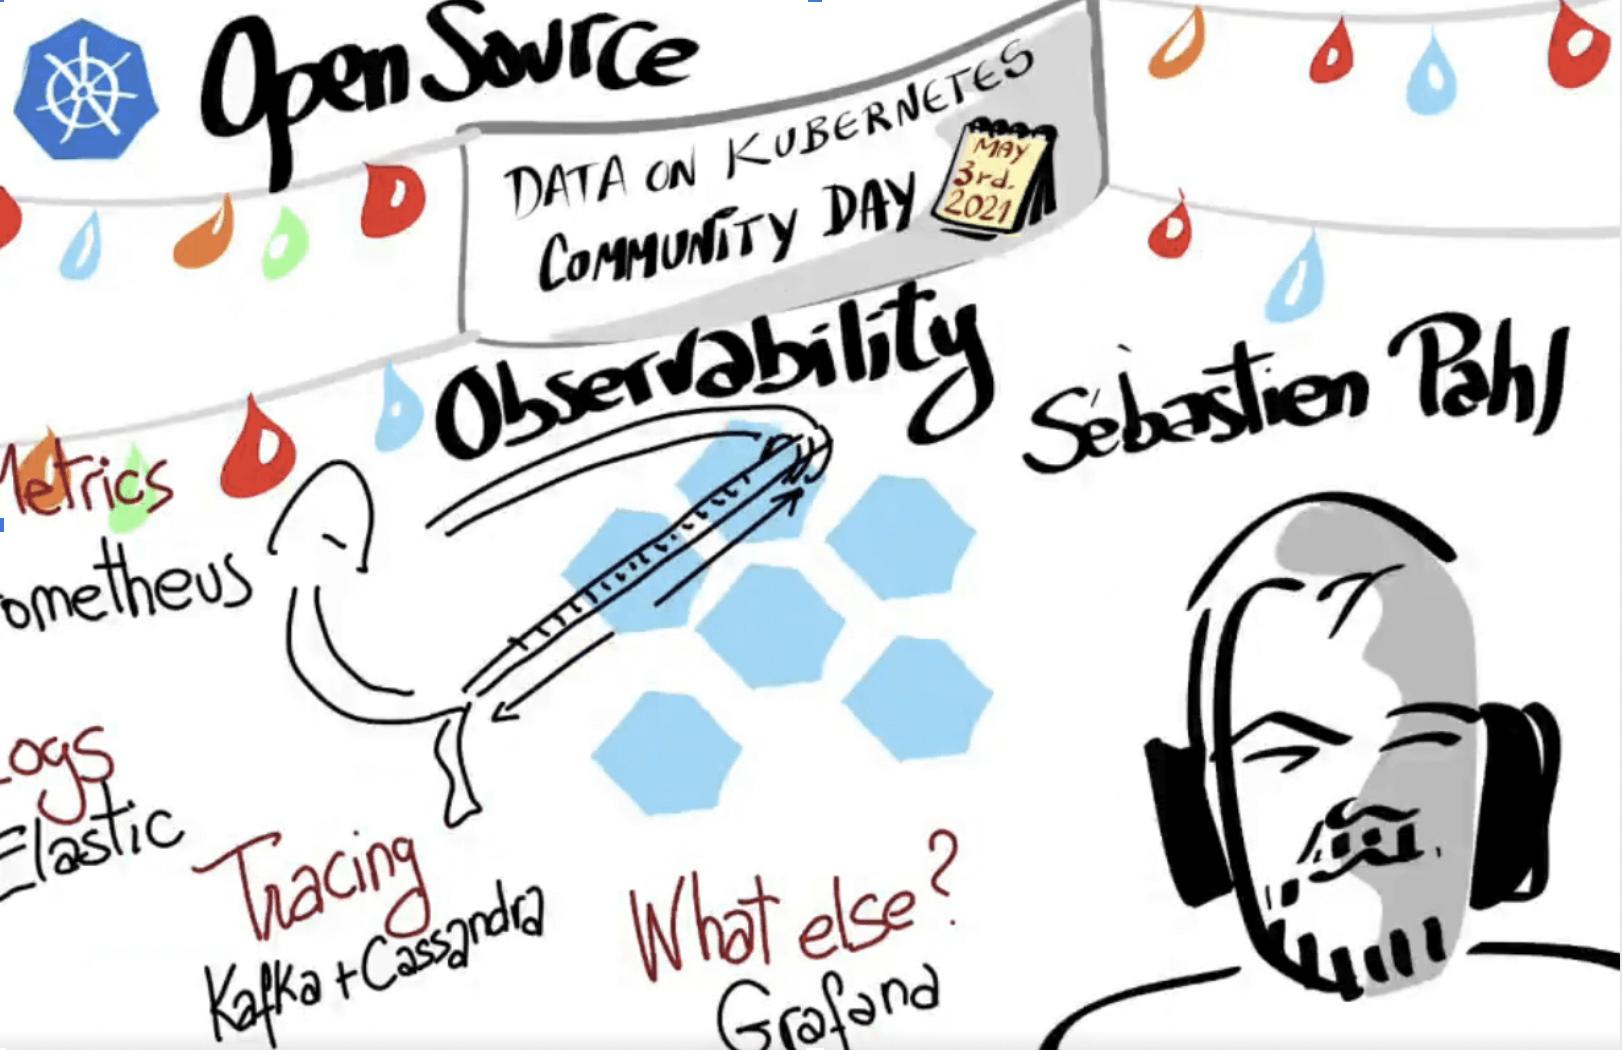 data on kubernetes community day carricature